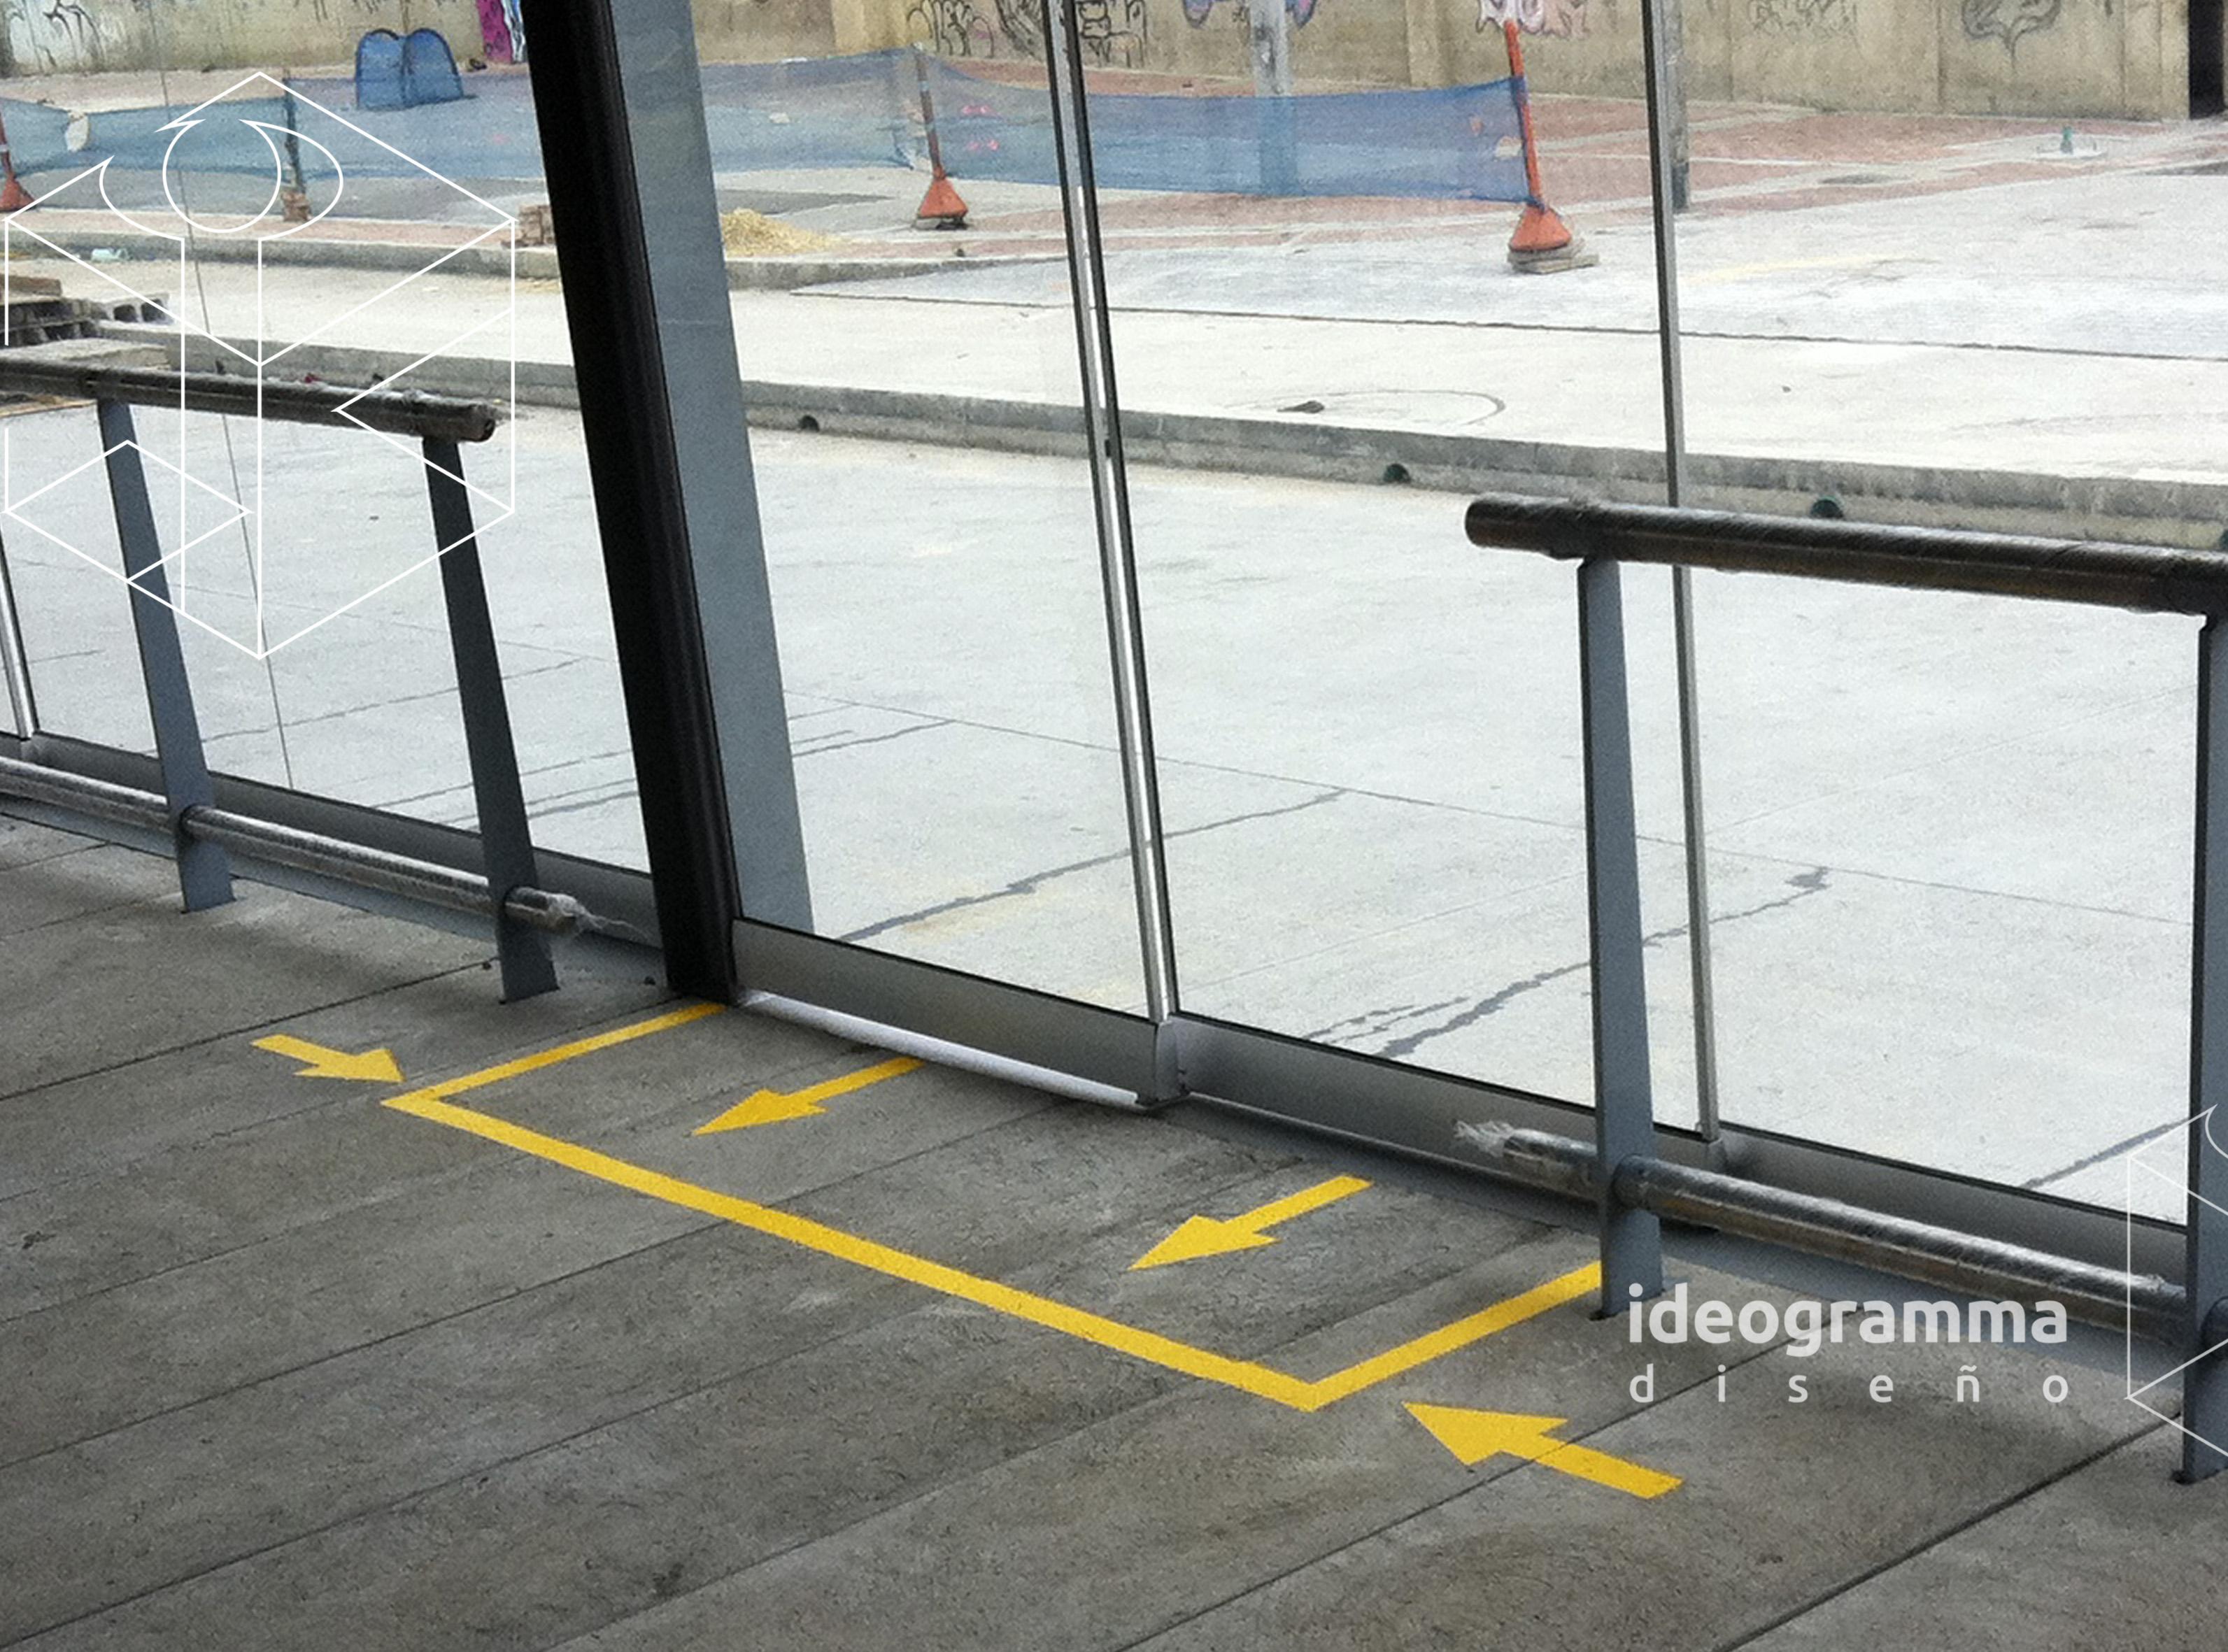 IDEO- marcas piso.jpg